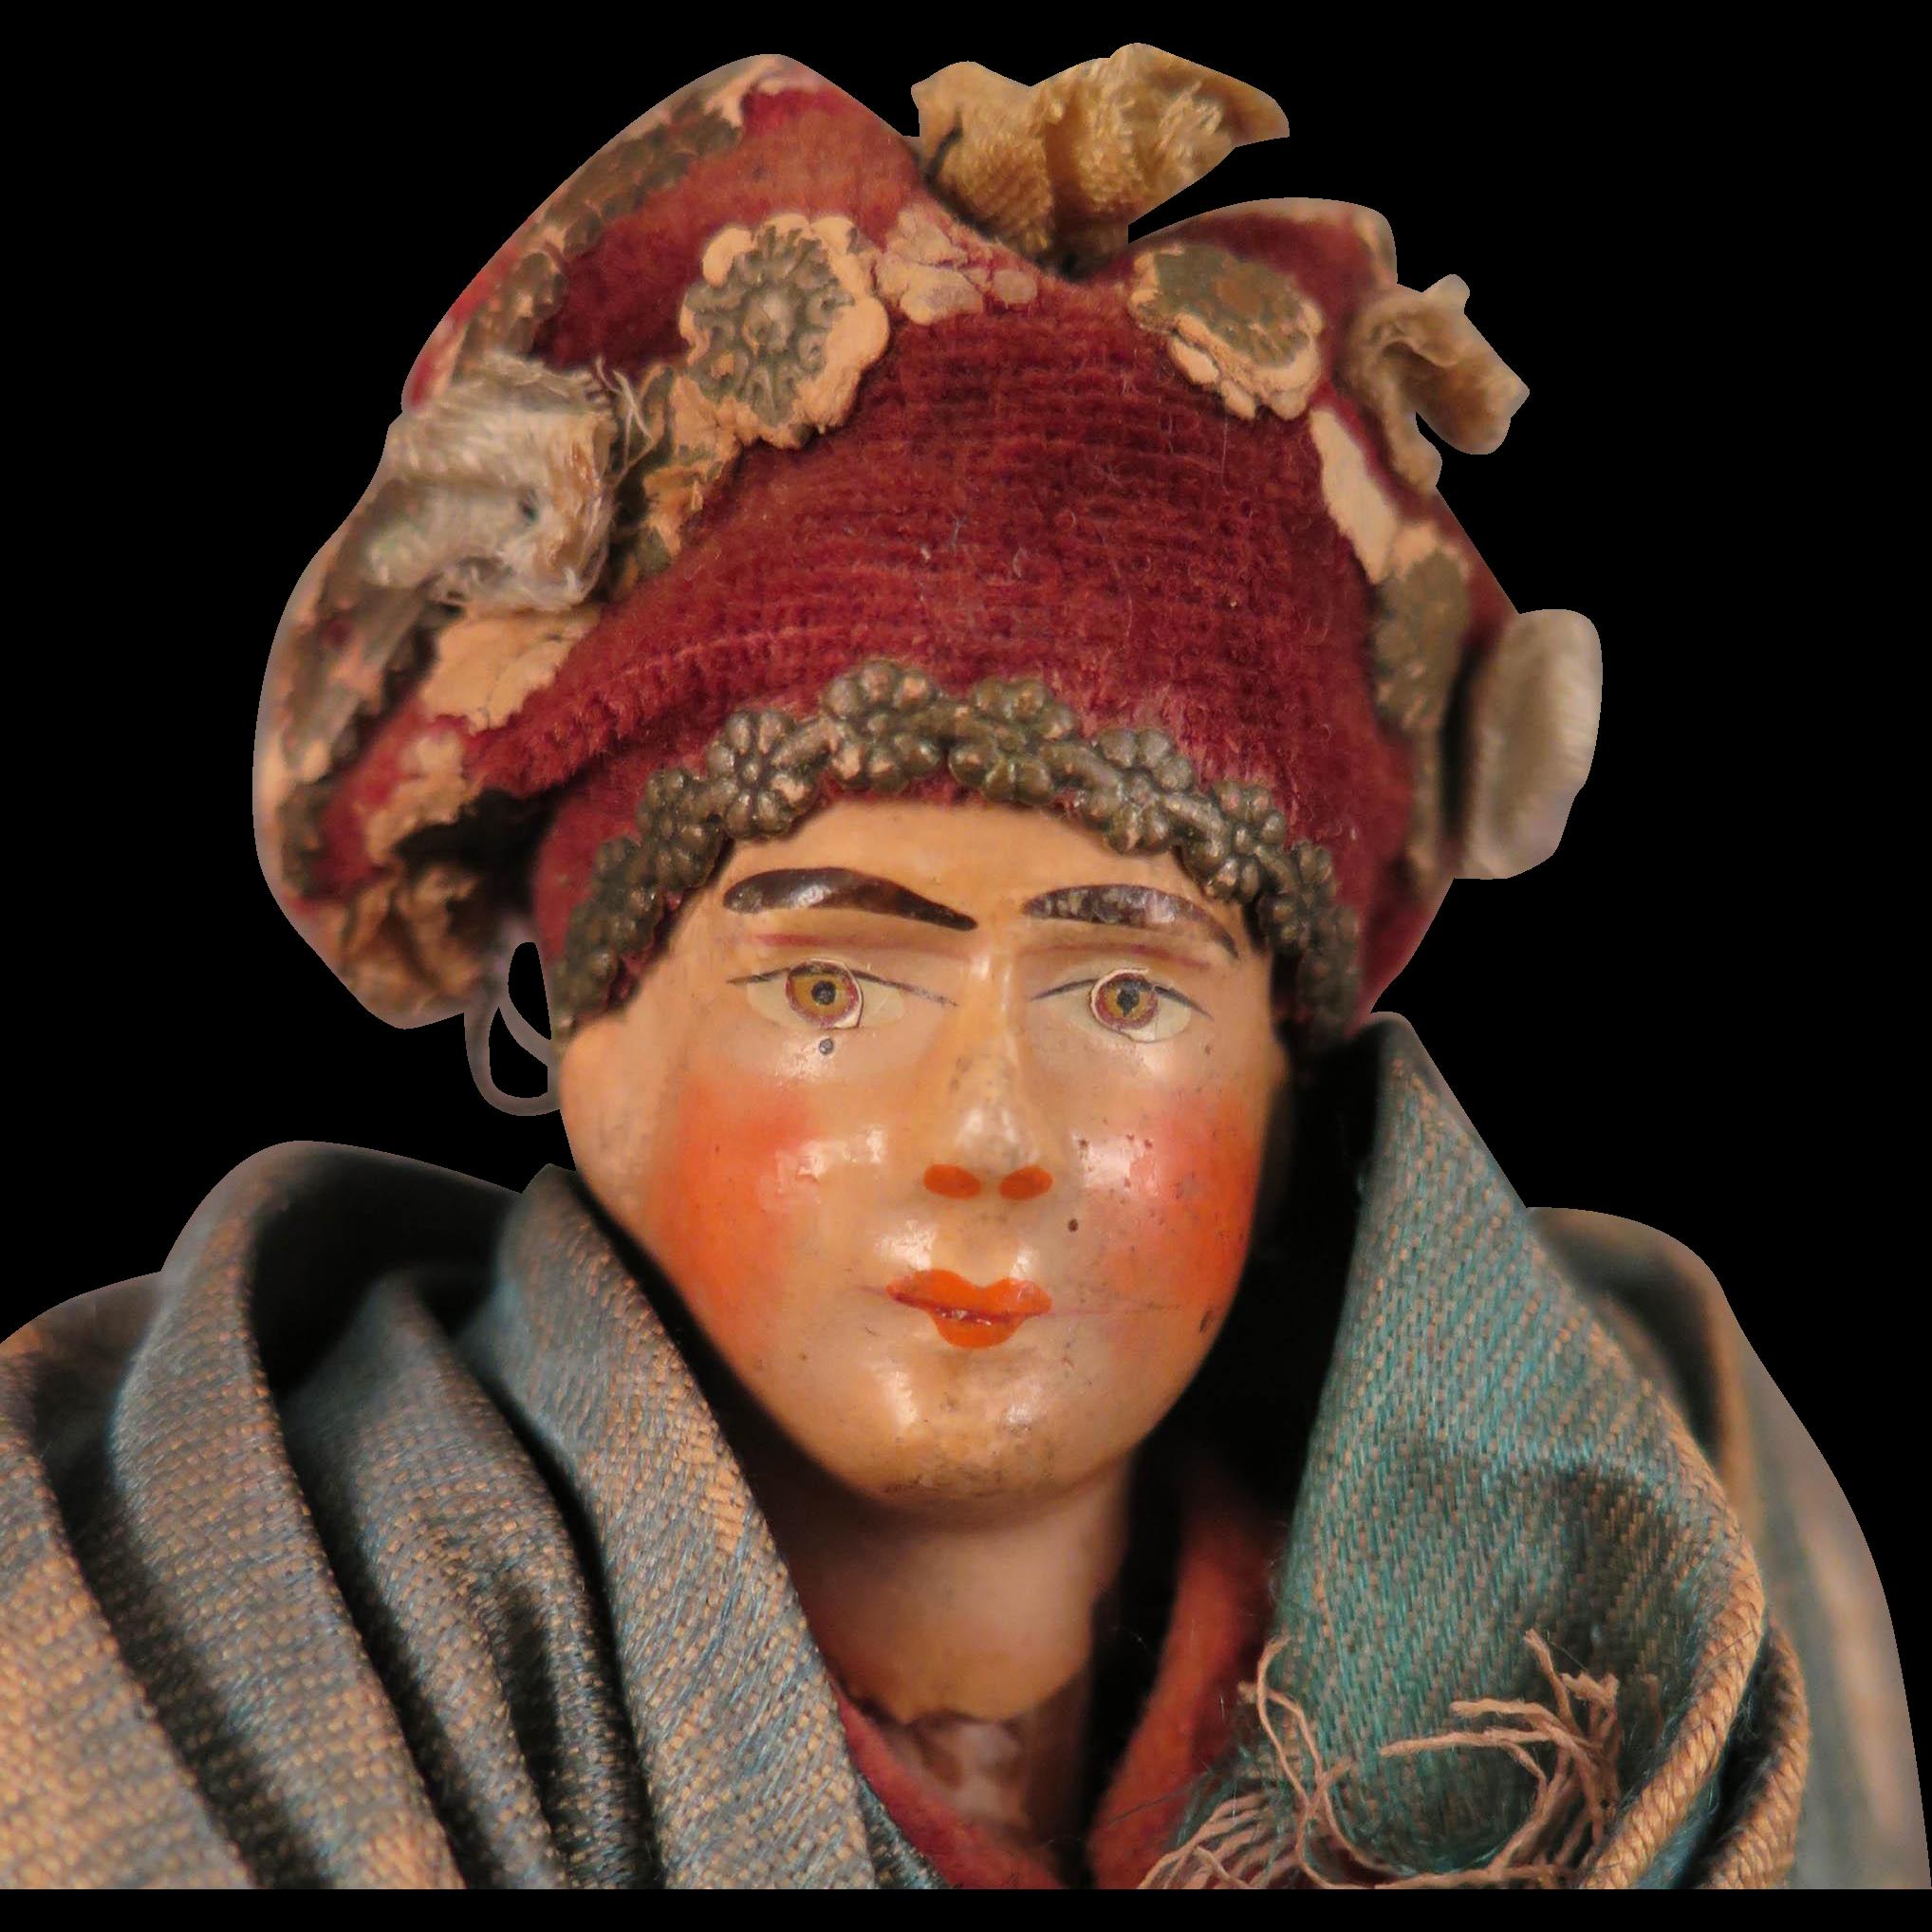 Antique Italian Terra Cotta Doll 9 inch